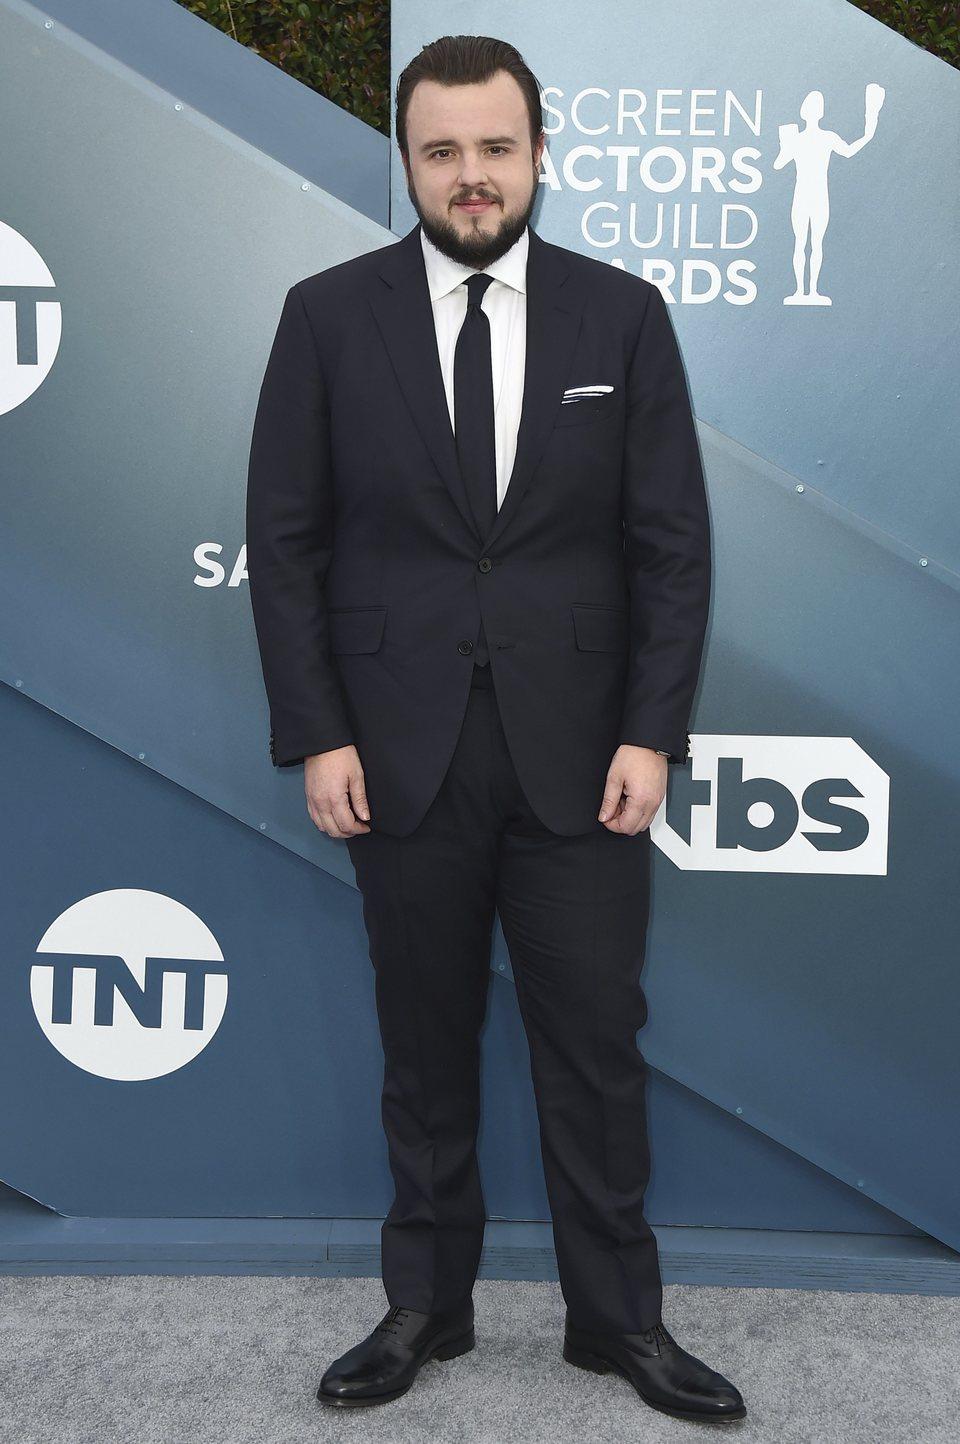 John Bradley on the red carpet at the SAG Awards 2020